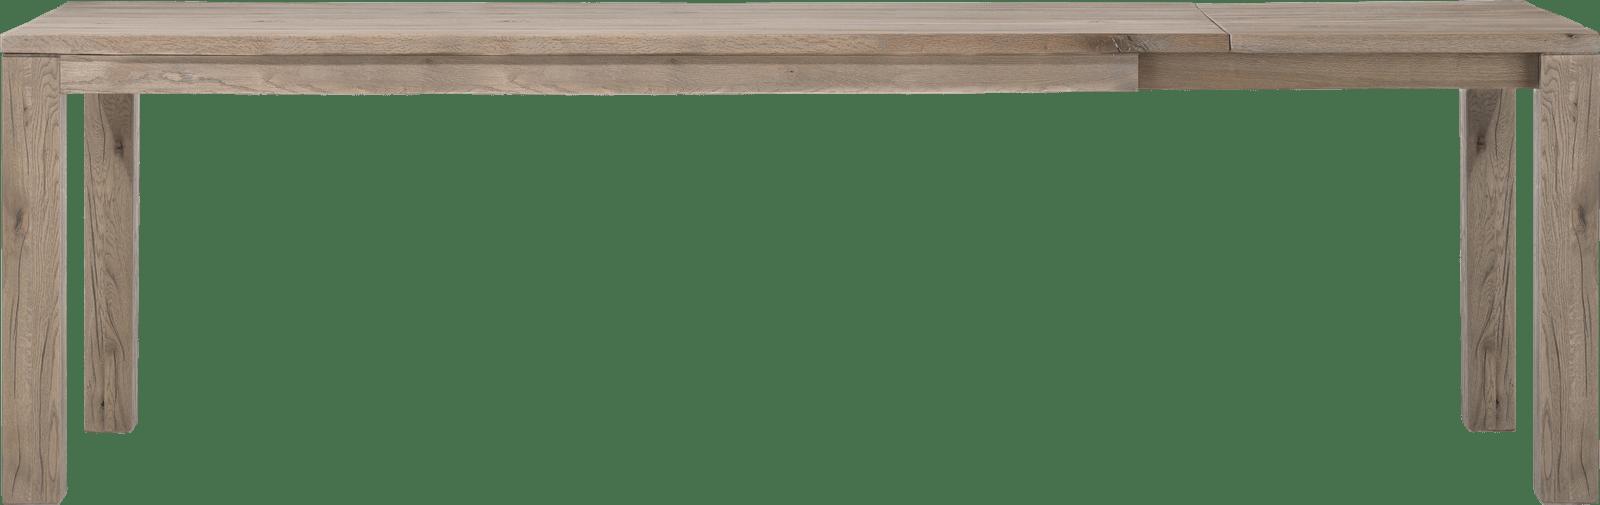 Masters - uitschuiftafel 200 (+ 60) x 100 cm - hout 9x9